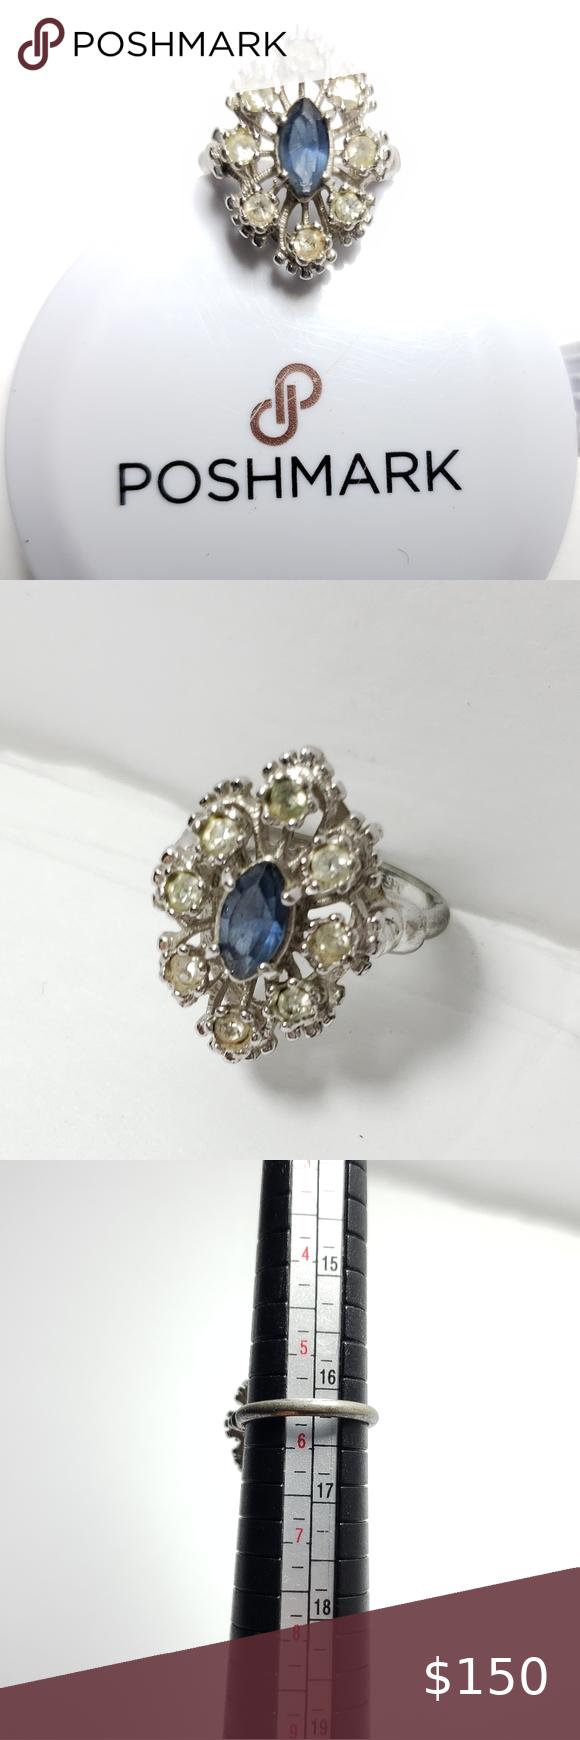 18k Hge Espo Vintage Ring Gorgeous A7 Jewelry Rings Womens Jewelry Rings Vintage Rings Jewelry